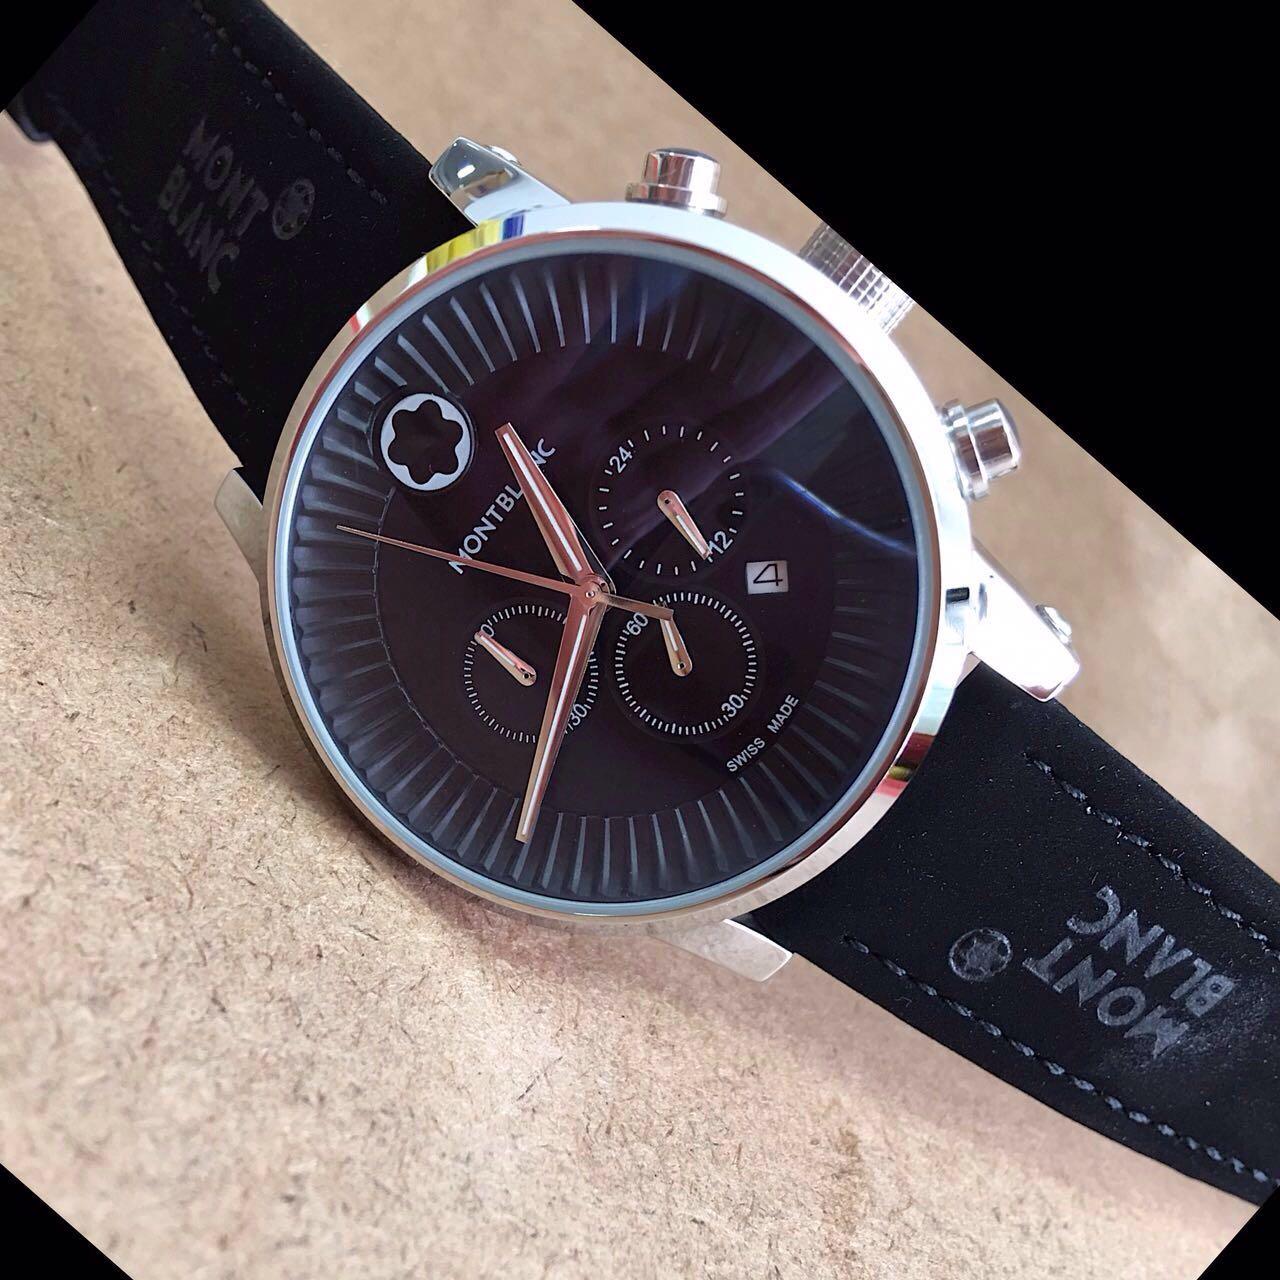 e538ffdbc62c9 Réplica de Relógio Mont Blanc – MB 24 Time Walker – Réplicas de Relógios